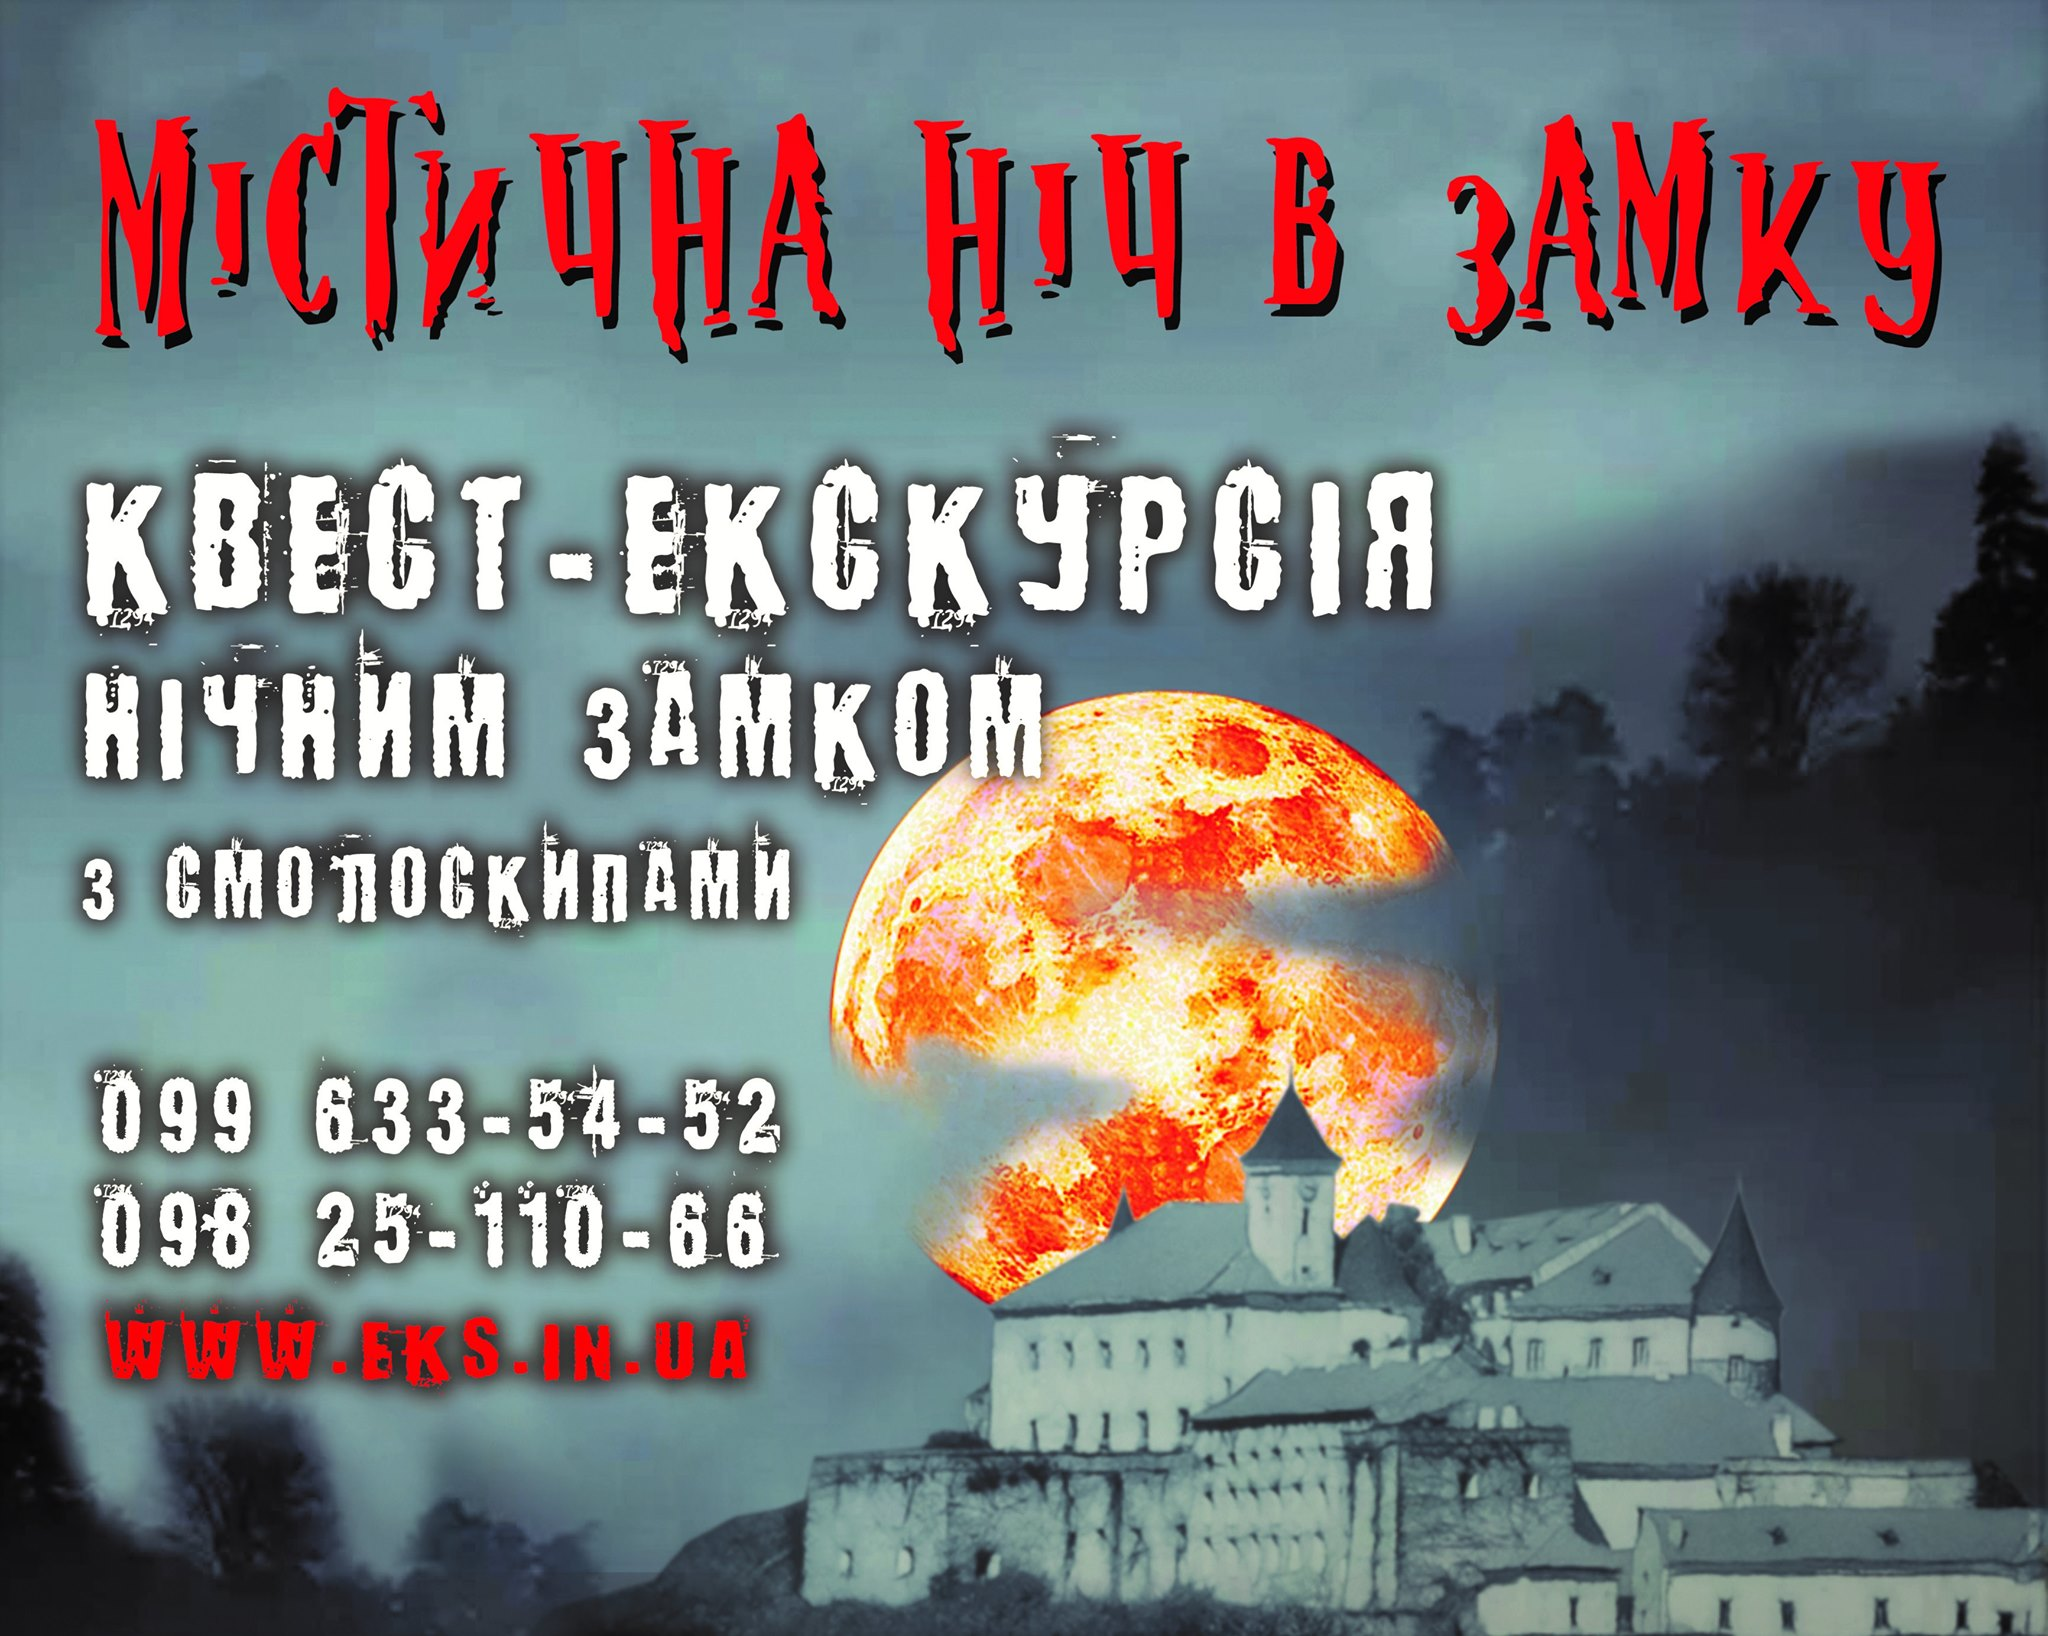 Містична ніч в замку – квест екскурсія в Мукачево